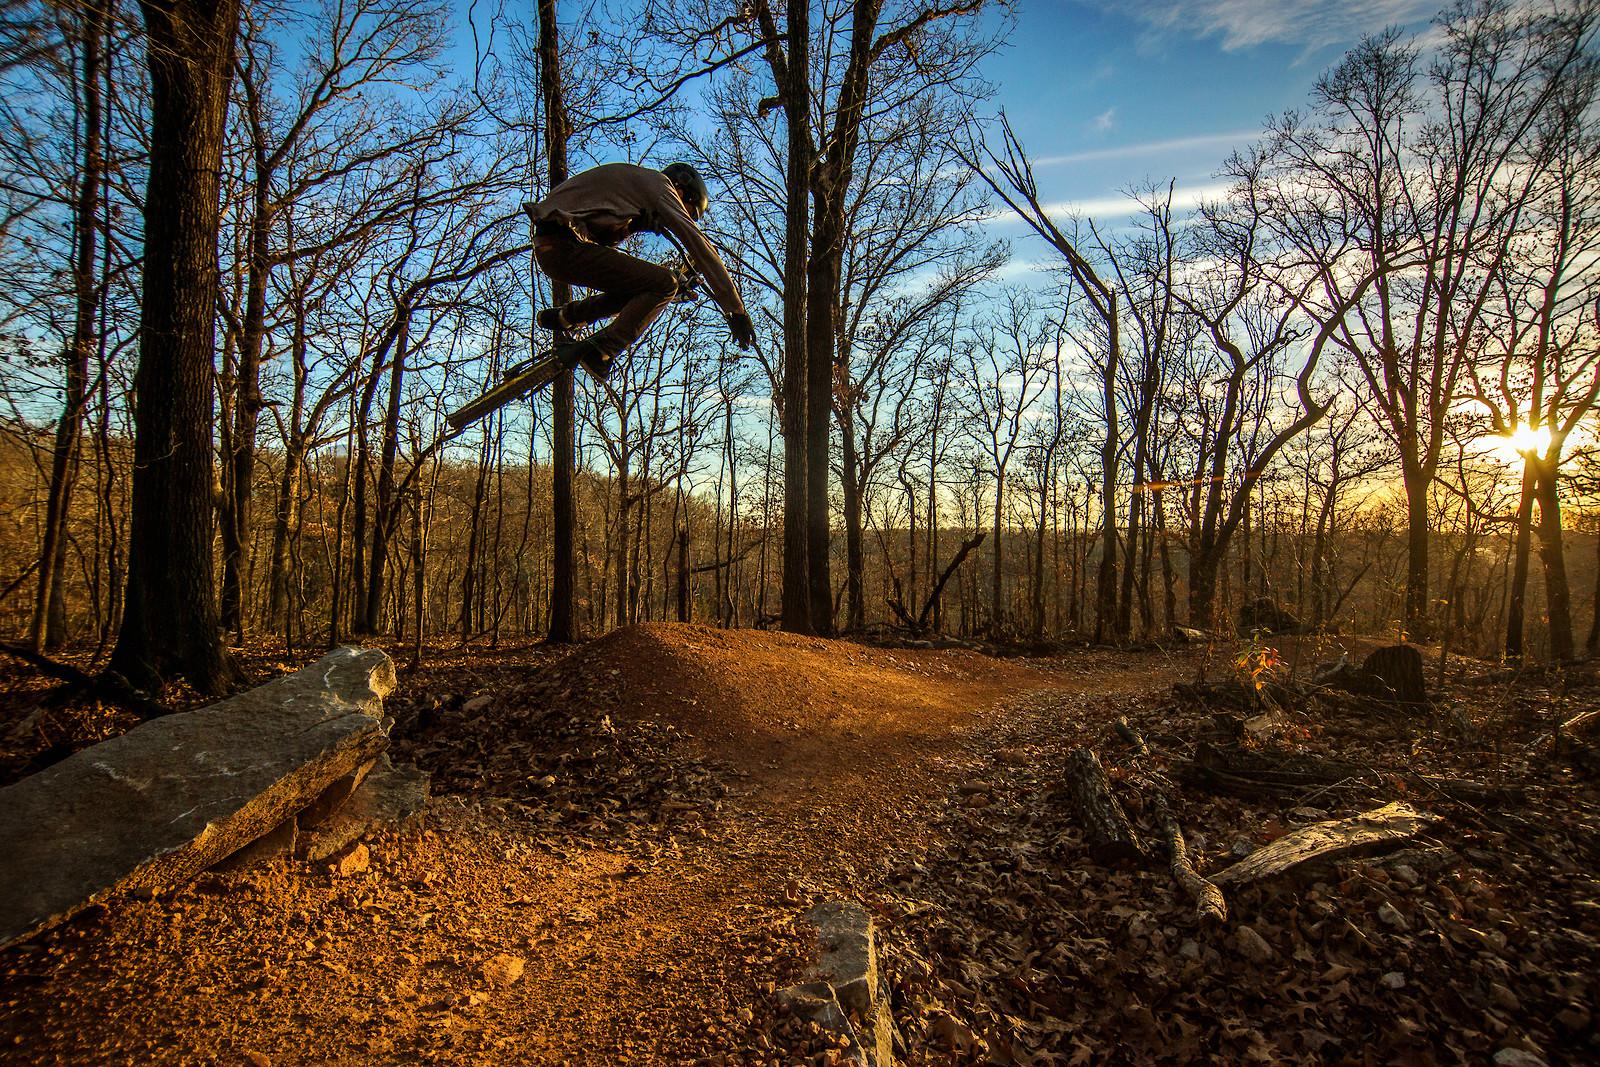 sunset rock hip 1 - slager - Mountain Biking Pictures - Vital MTB